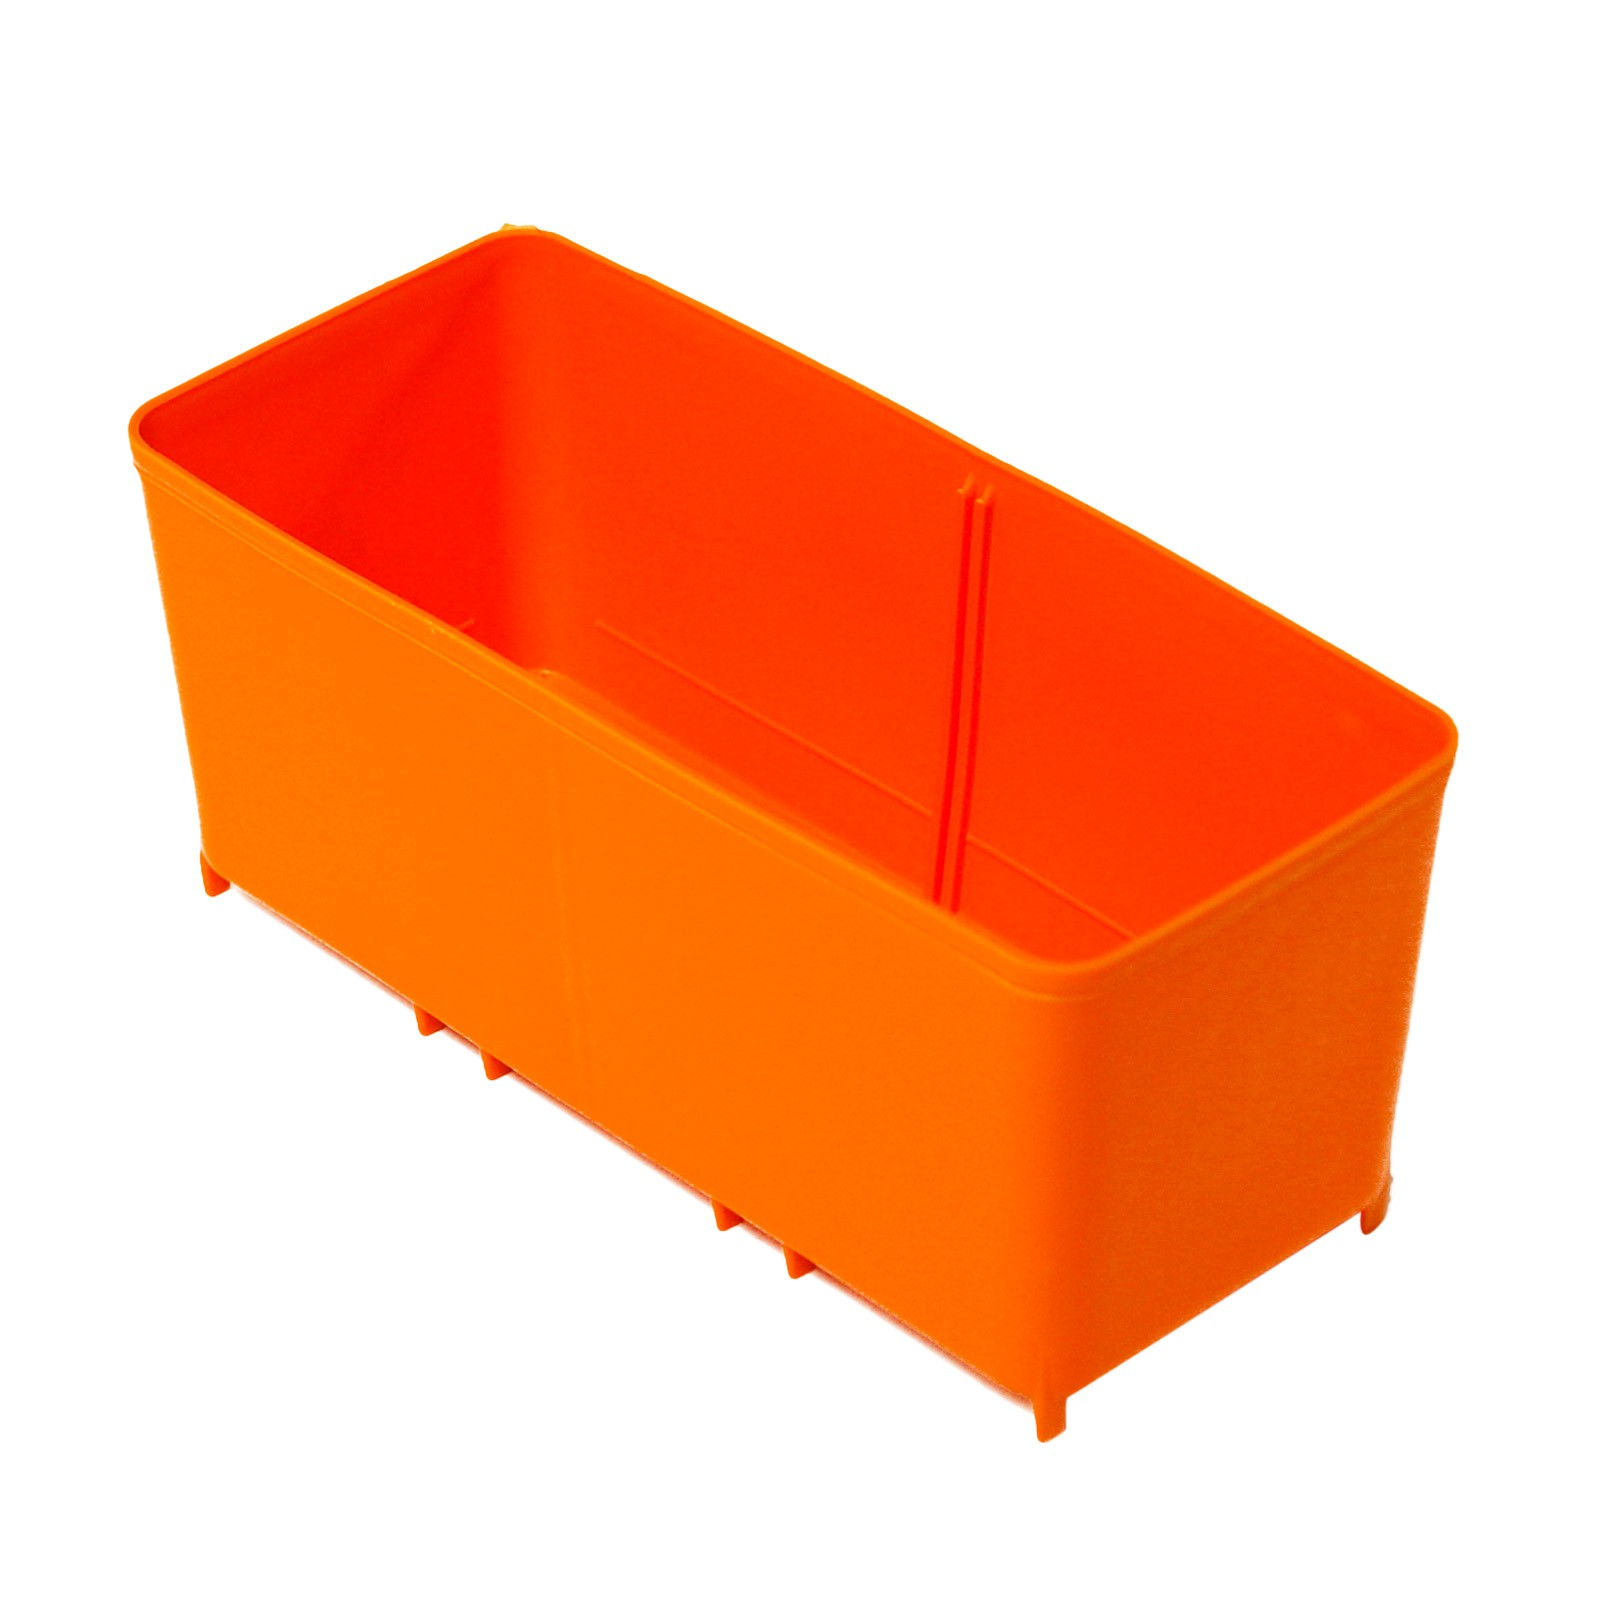 pvc sortimentsbox aufbewahrungsbox aufbewahrung box 210x90x94mm orange. Black Bedroom Furniture Sets. Home Design Ideas